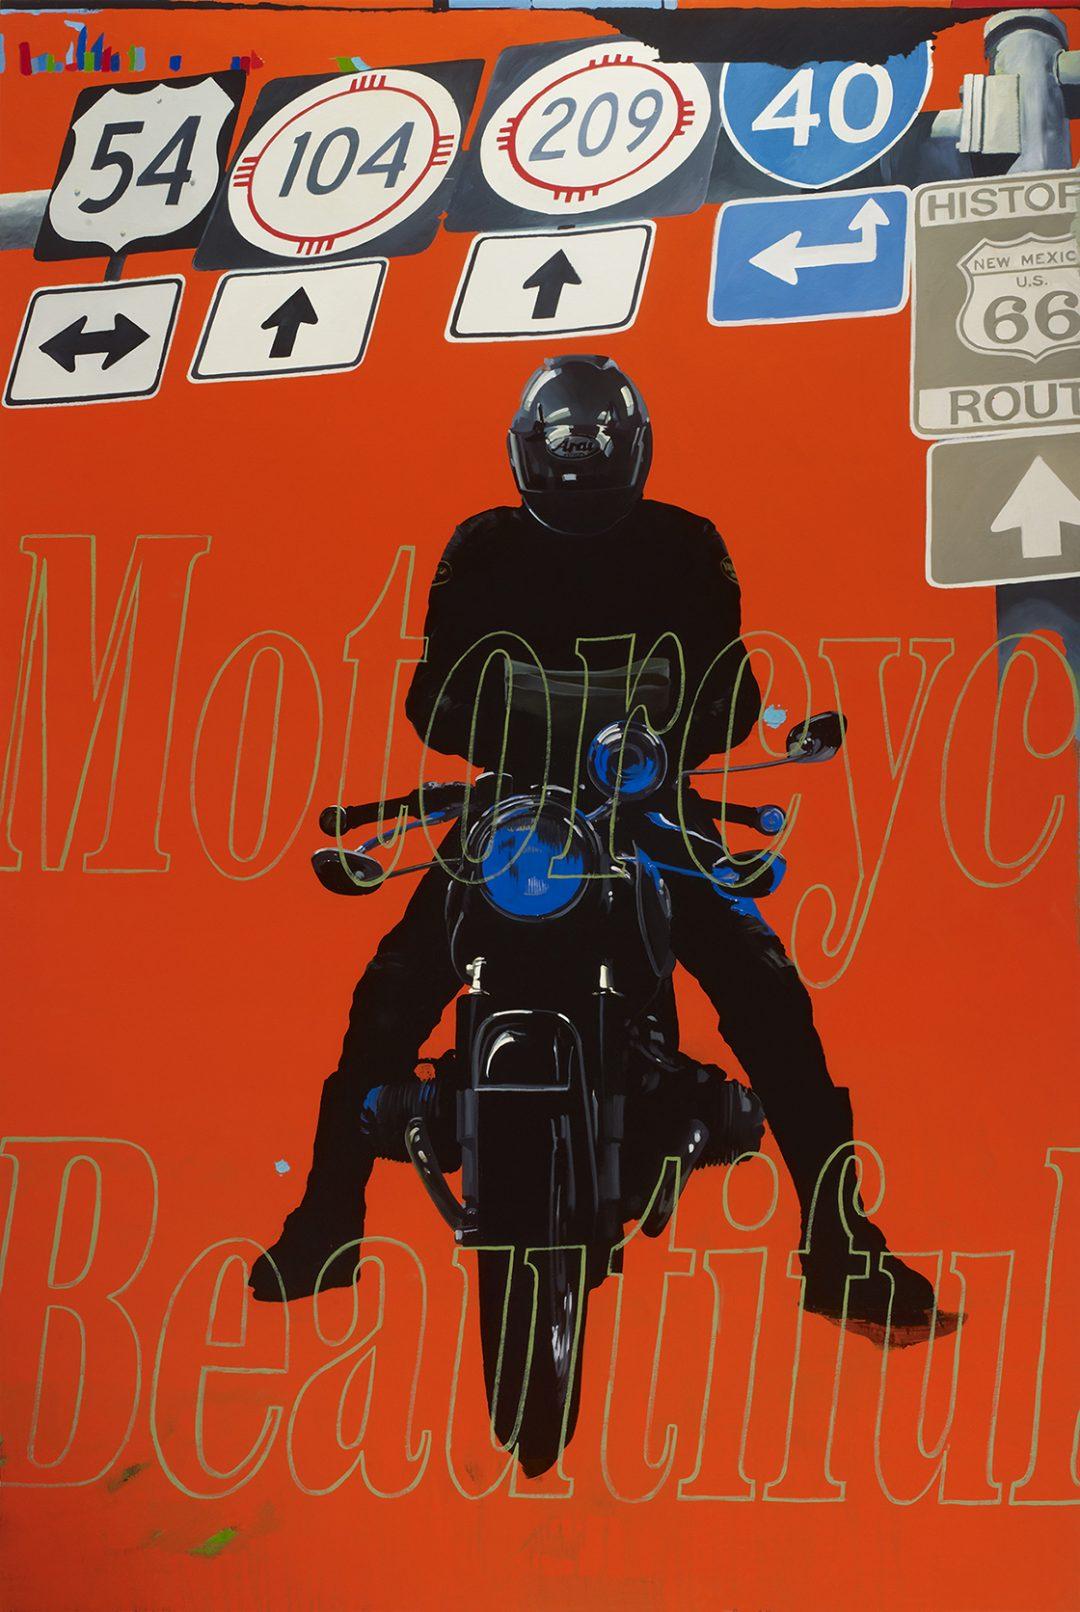 Orange Rider, Motorcycle Beautiful (Navigating Man, From Eight Days) - James Lahey